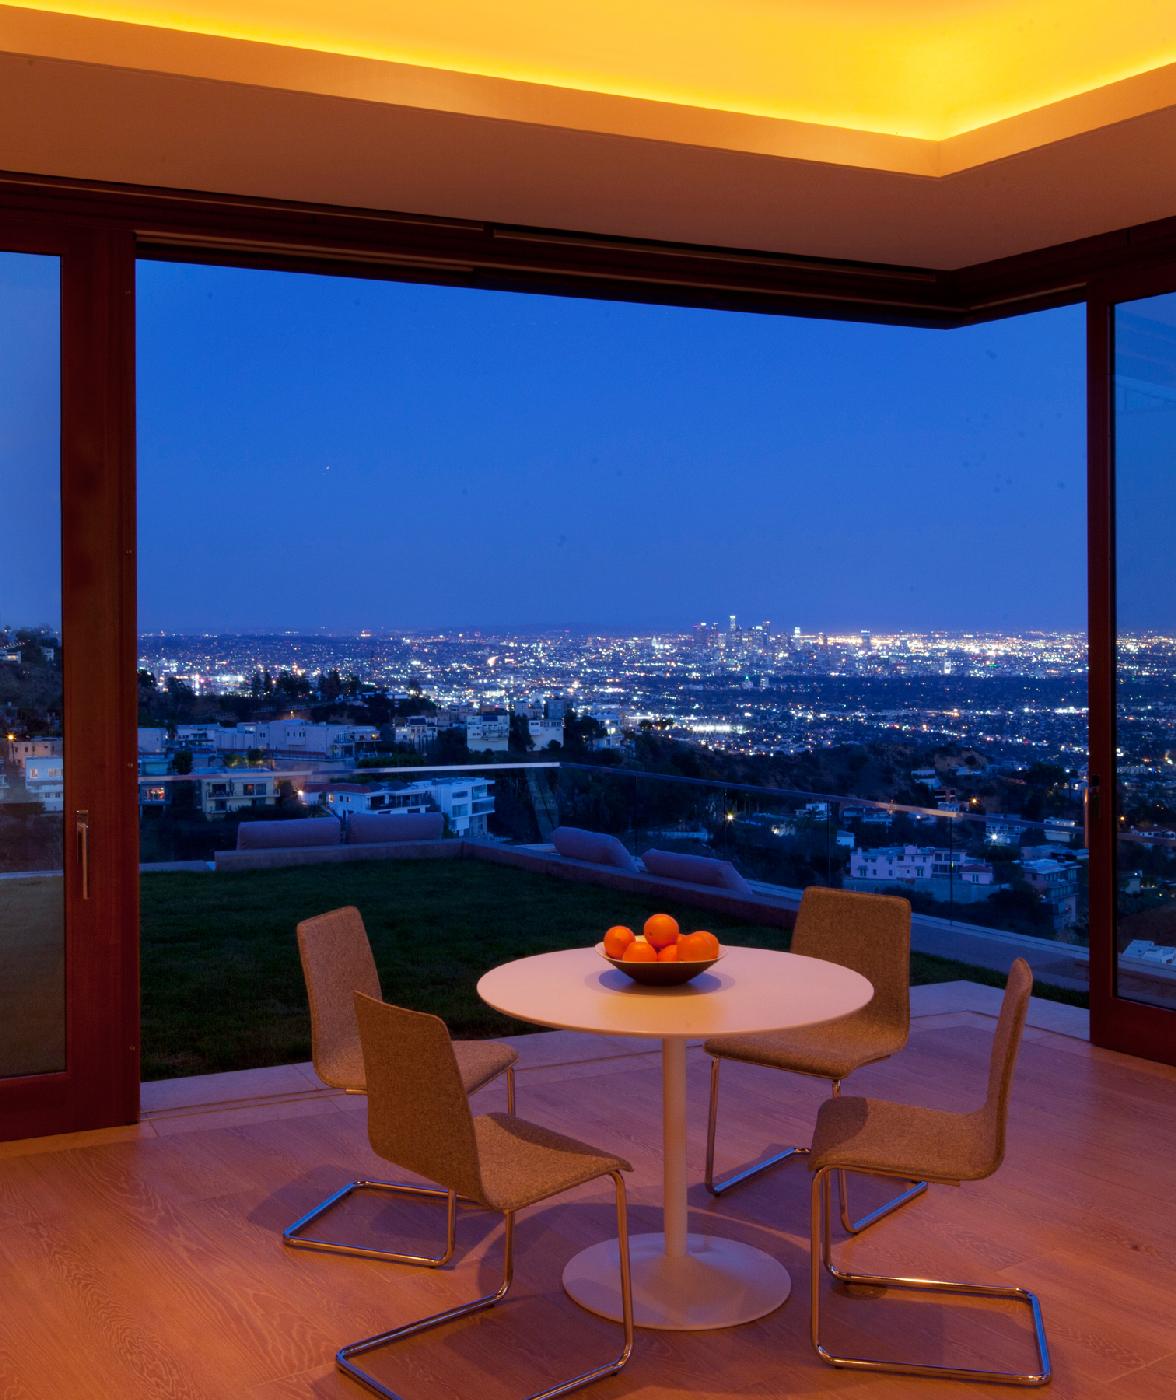 sitting-spot-evening-over-city.jpg